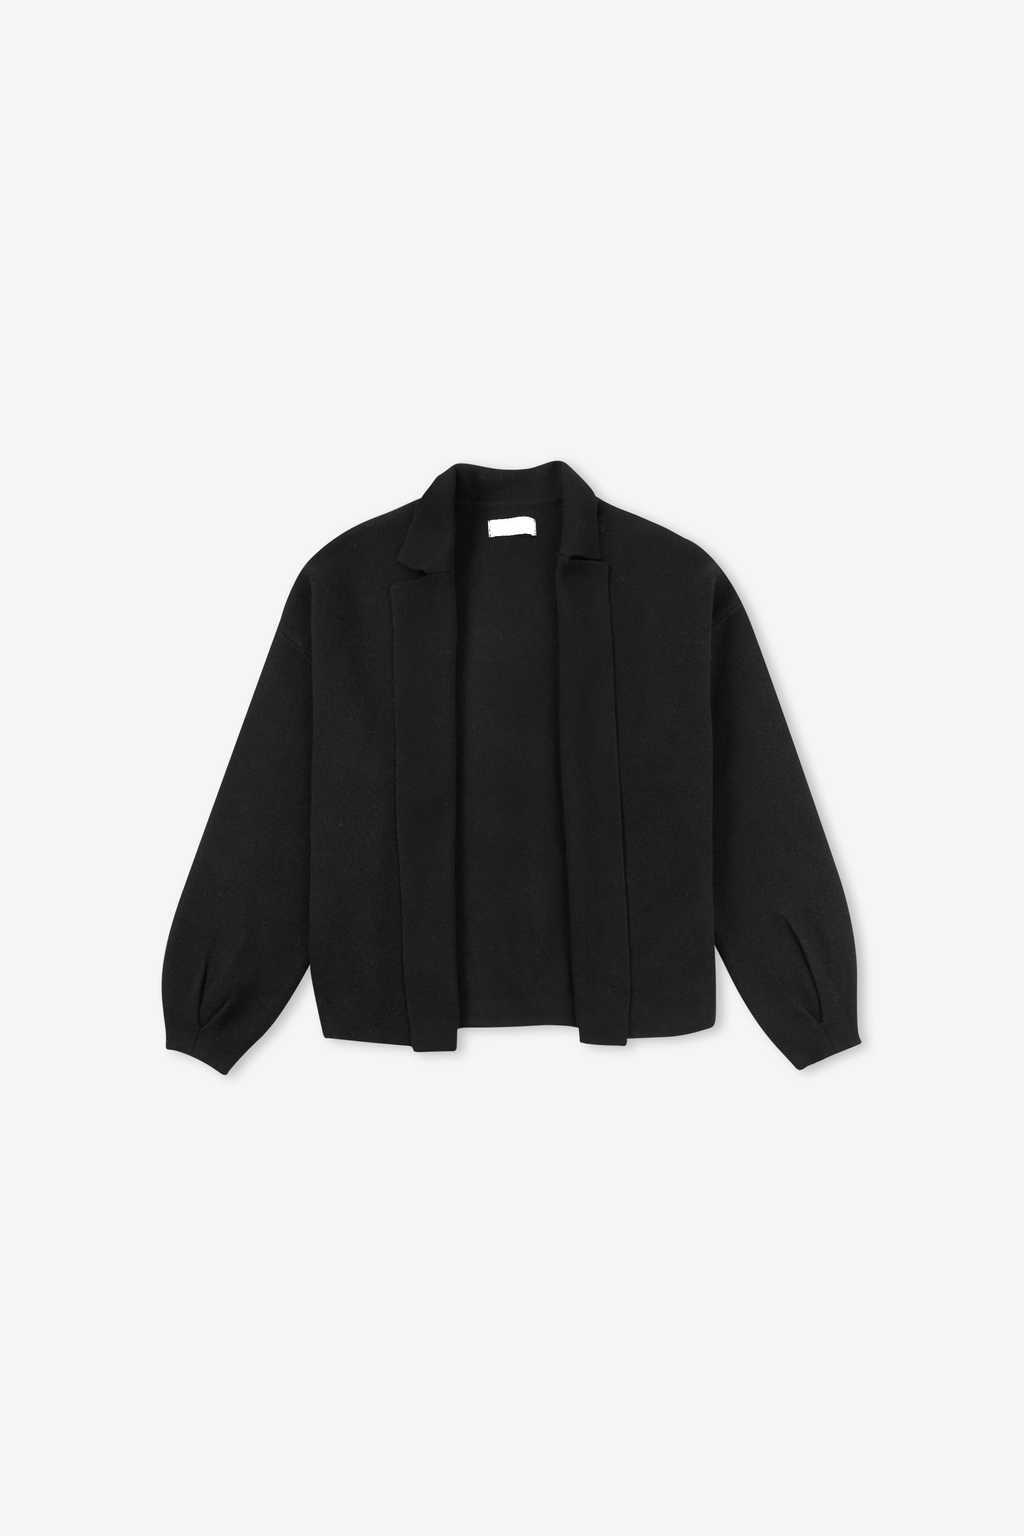 Sweater 2470 Black 5